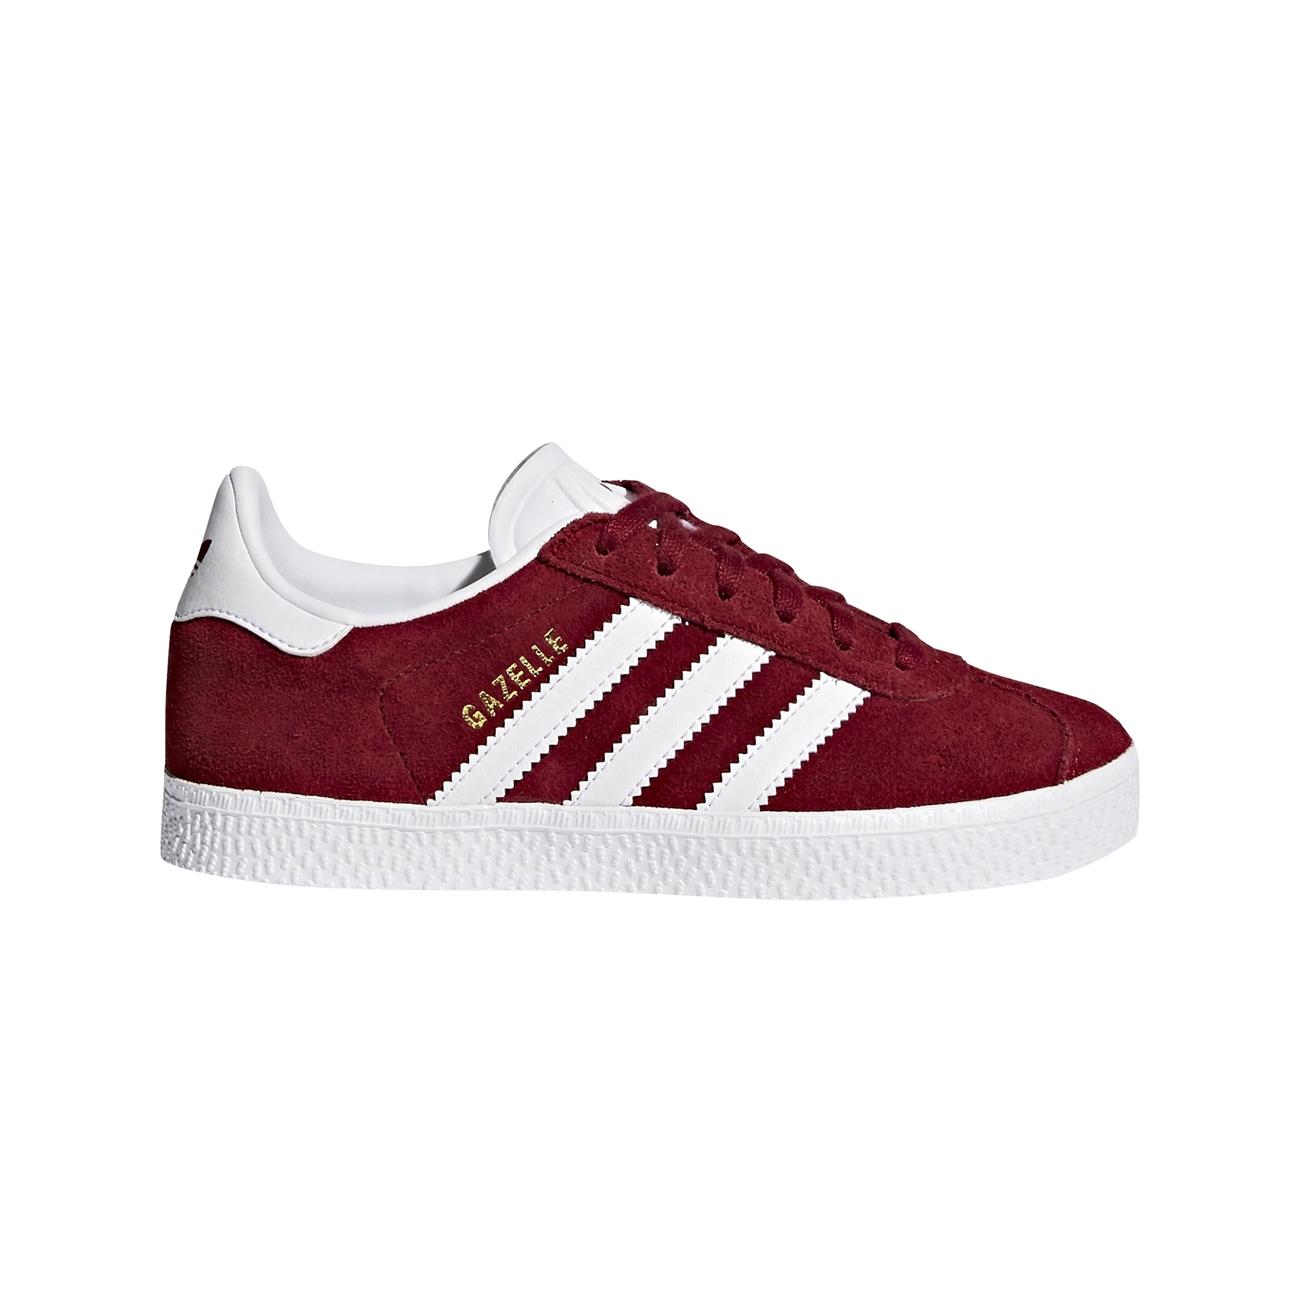 get cheap d6e81 e32aa buy adidas forum mid rojo blanco flag f7622 adc87. 2019-03-11 18 58 48.  cheap adidas originals gazelle c collegiate burgundy 94534 3018a